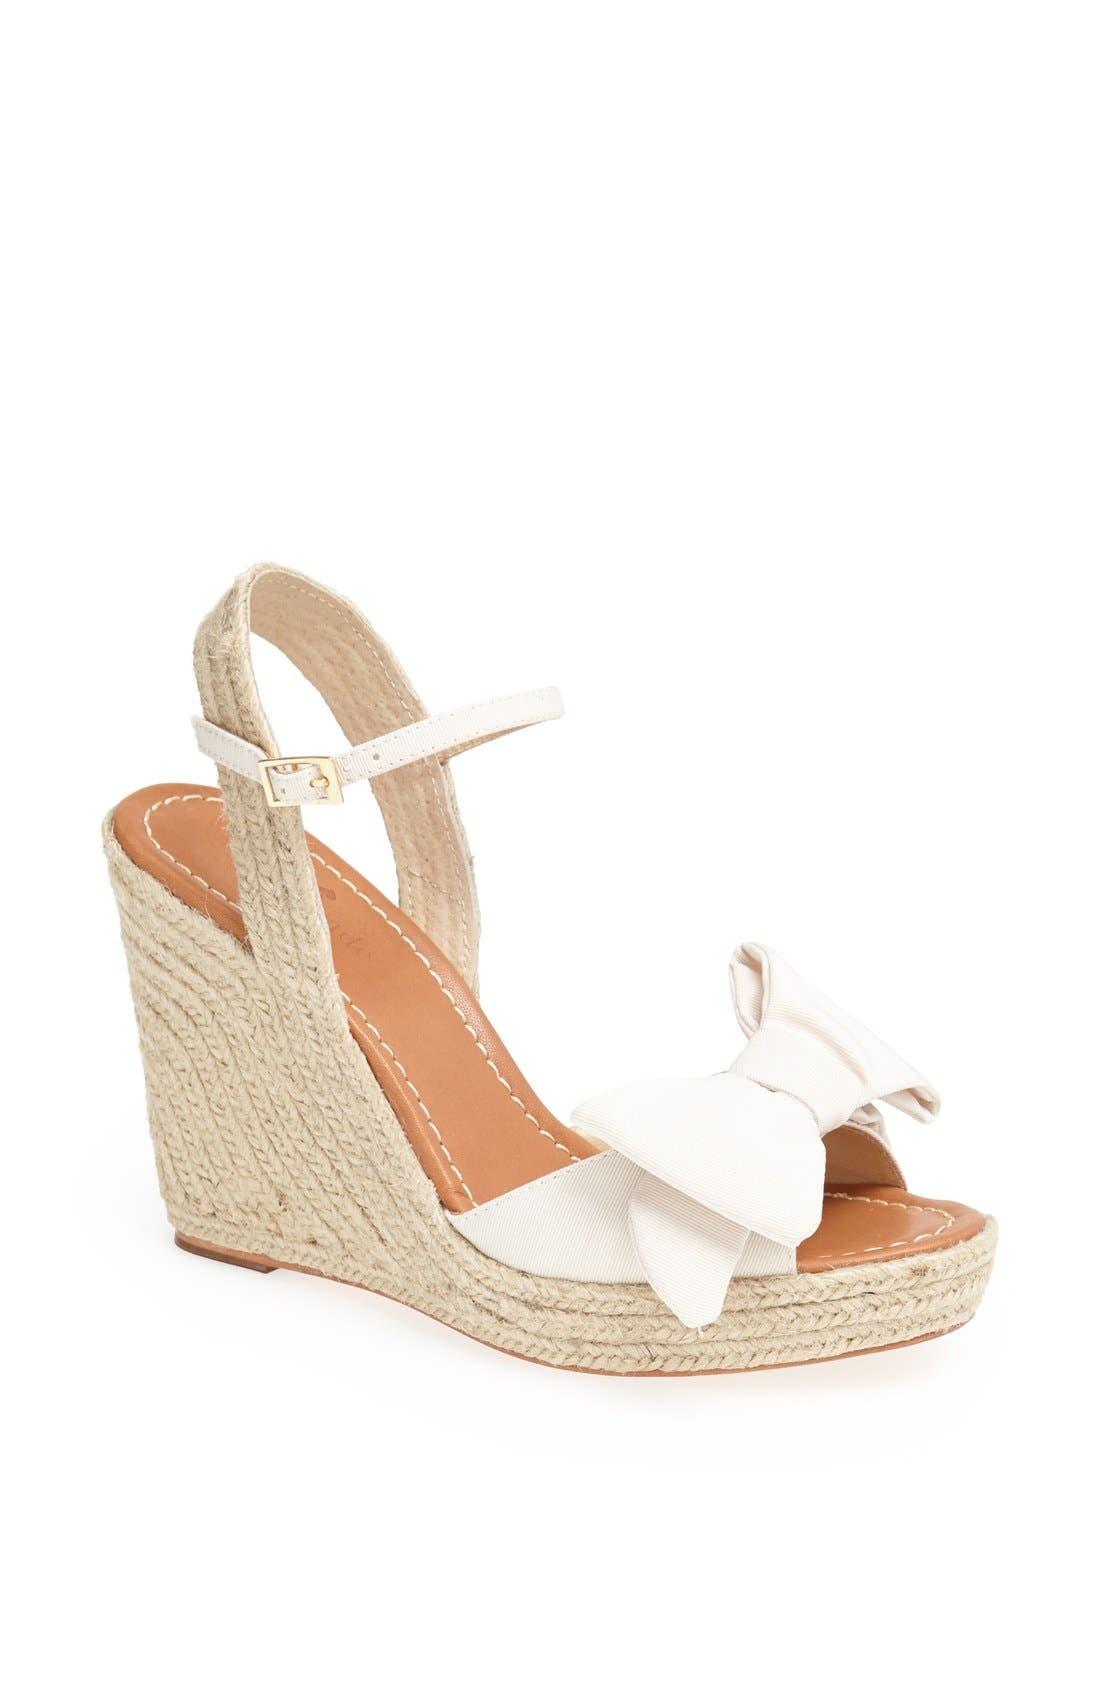 Alternate Image 1 Selected - kate spade new york 'jumper' sandal